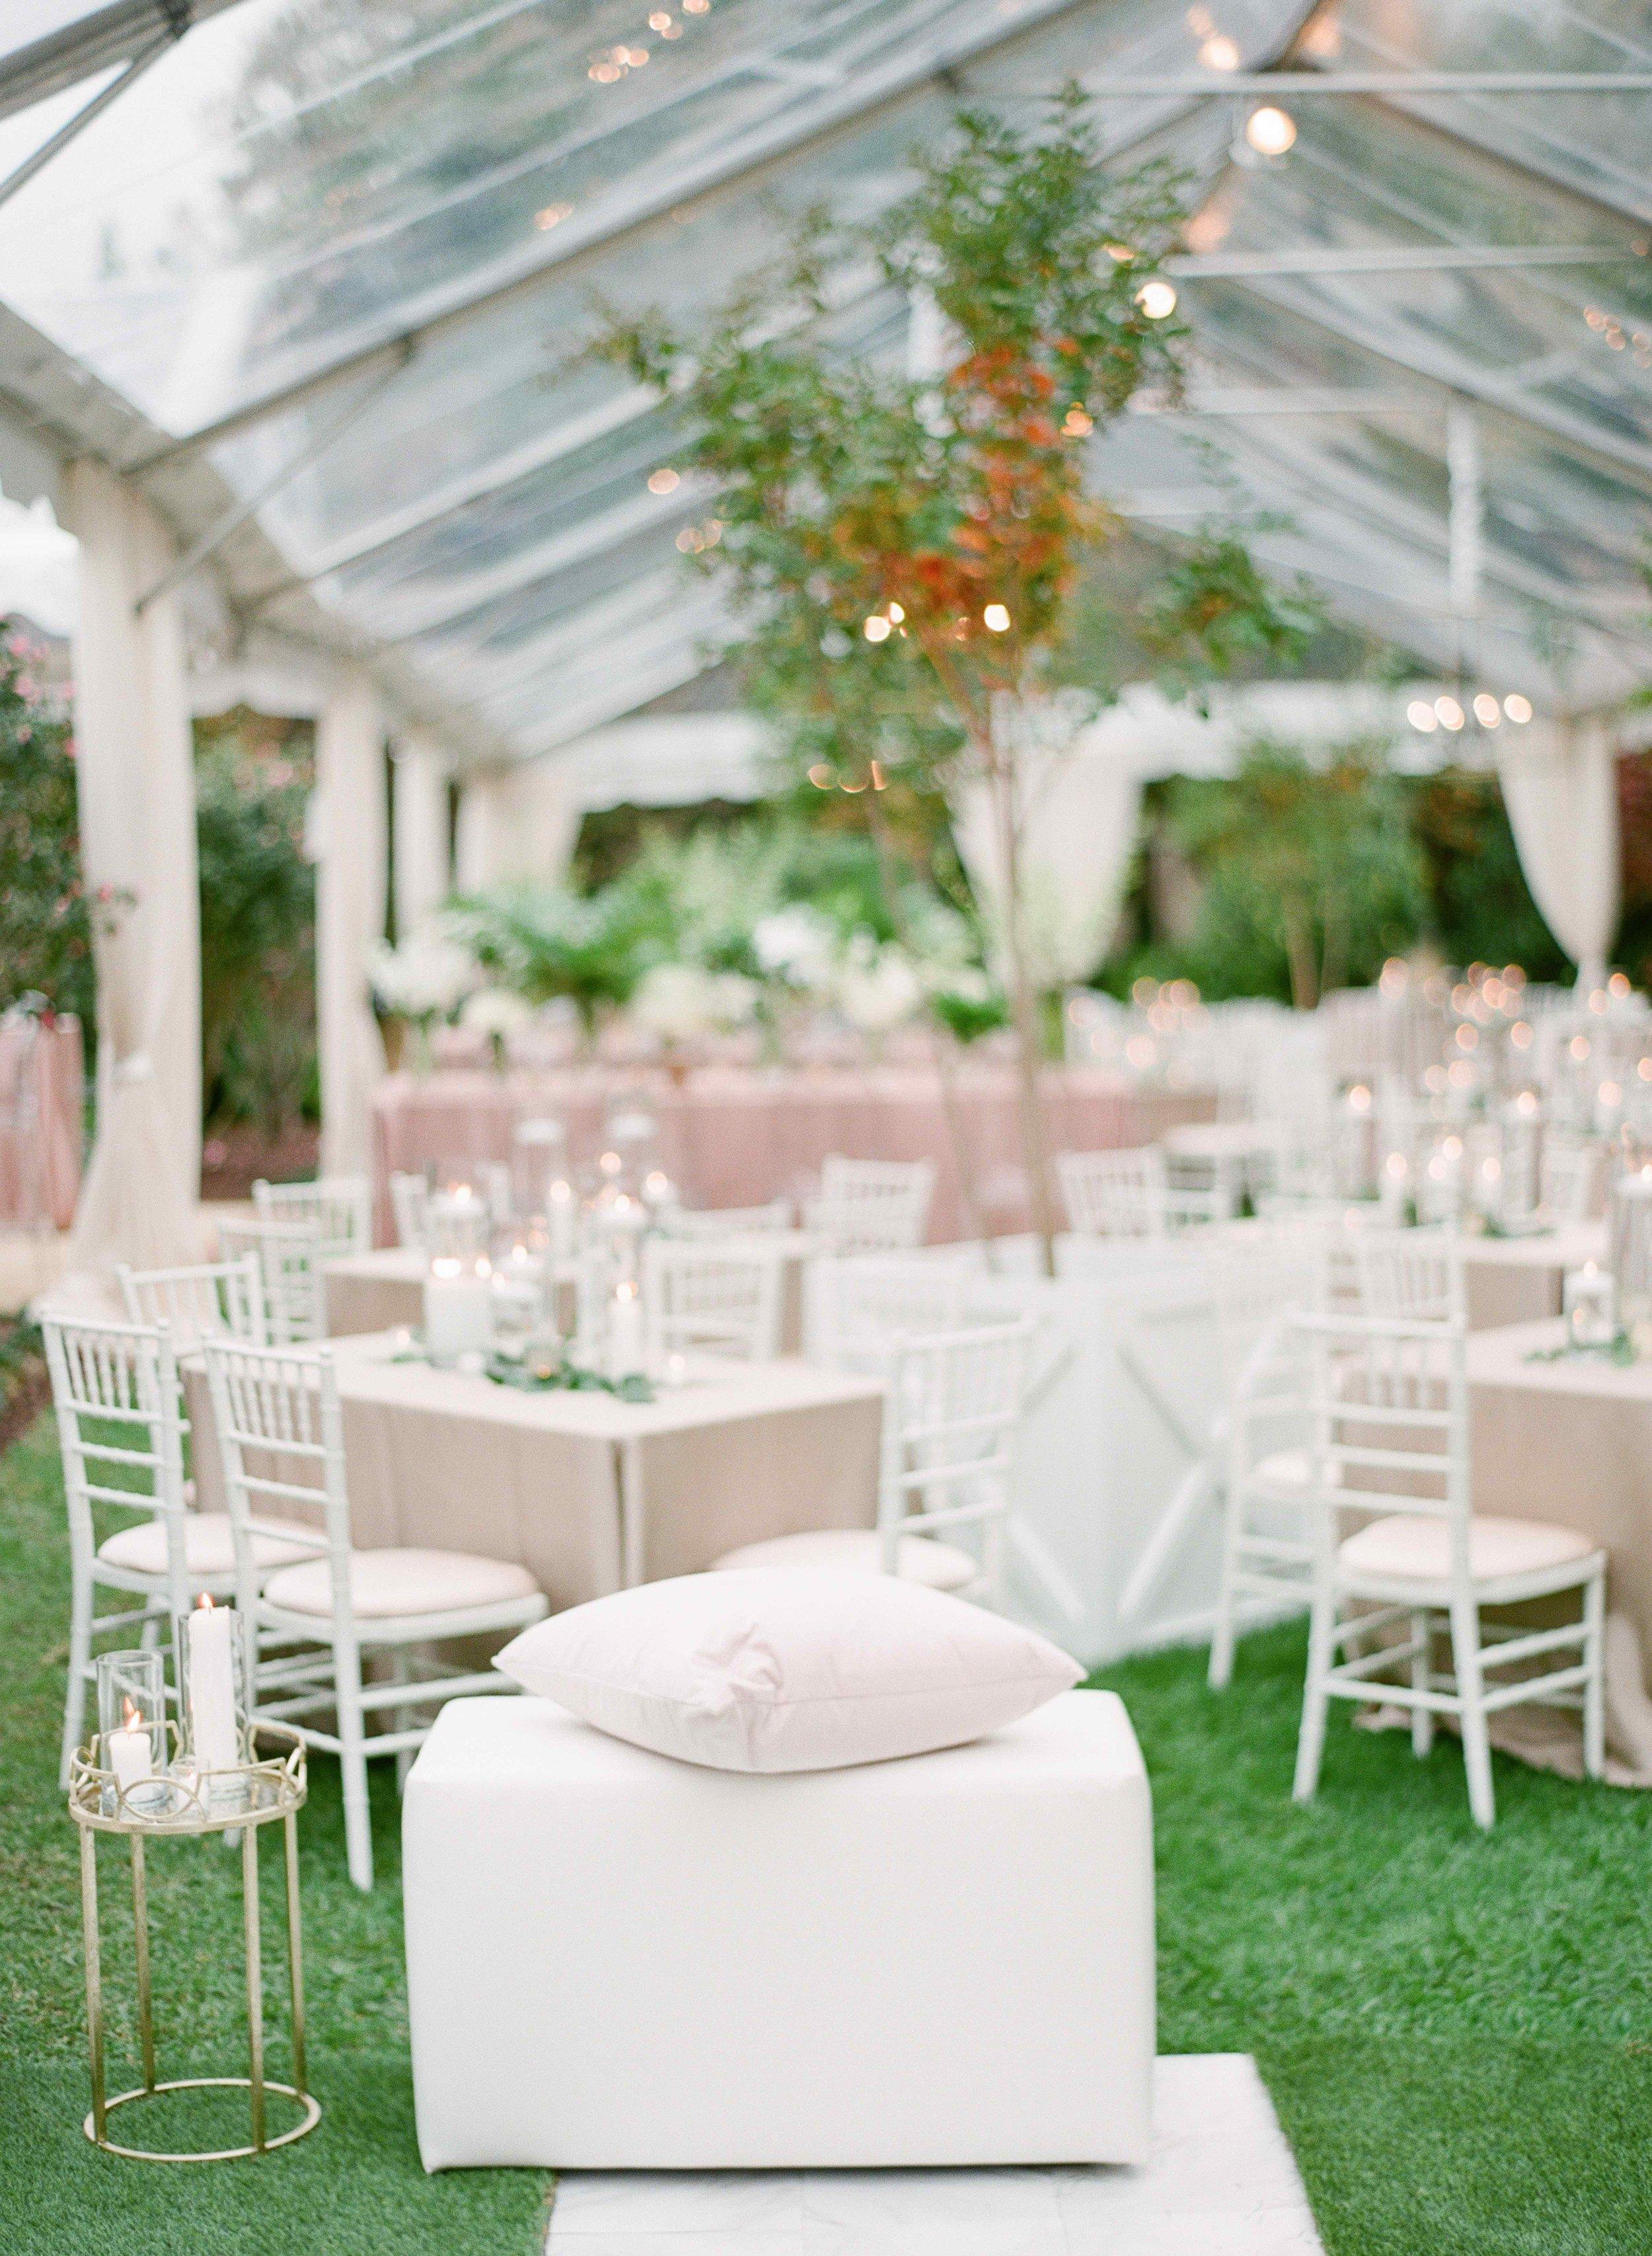 raleigh_nc_wedding_photographer_film_caseyrosephotography_sydbuzz_168.jpg